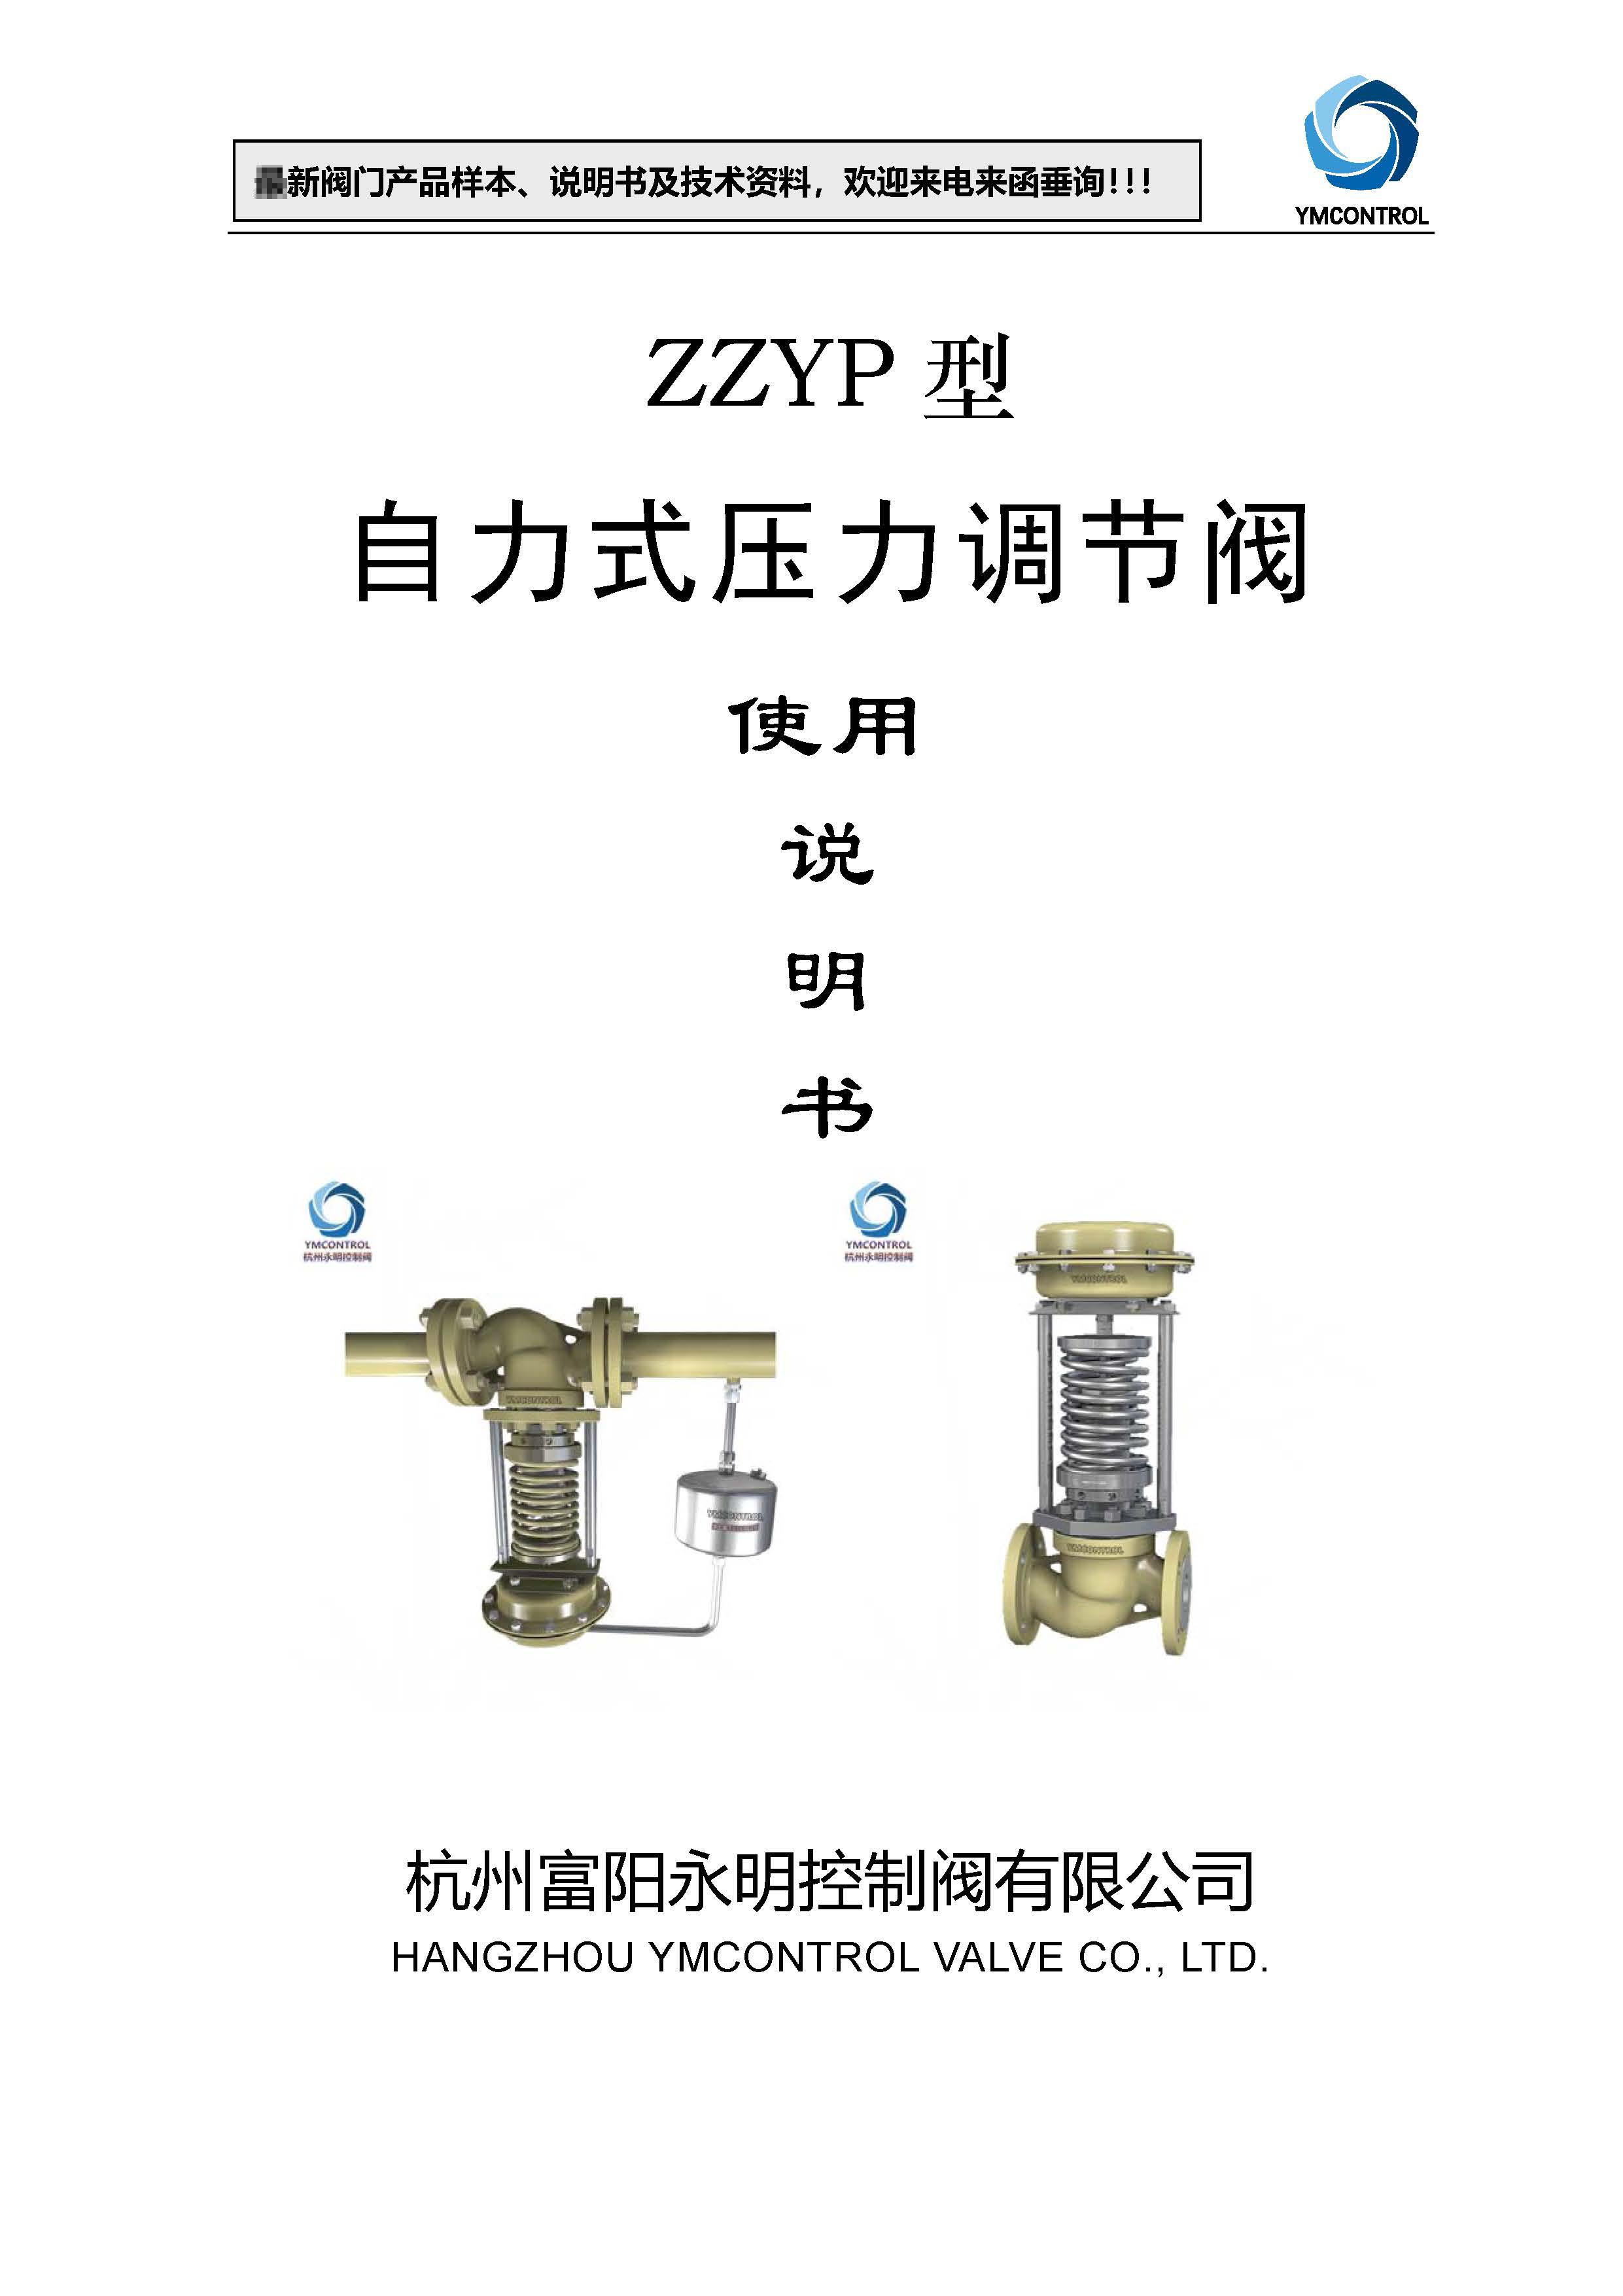 V230-ZZYP自力式壓力調節閥,蒸汽減壓閥樣本說明書